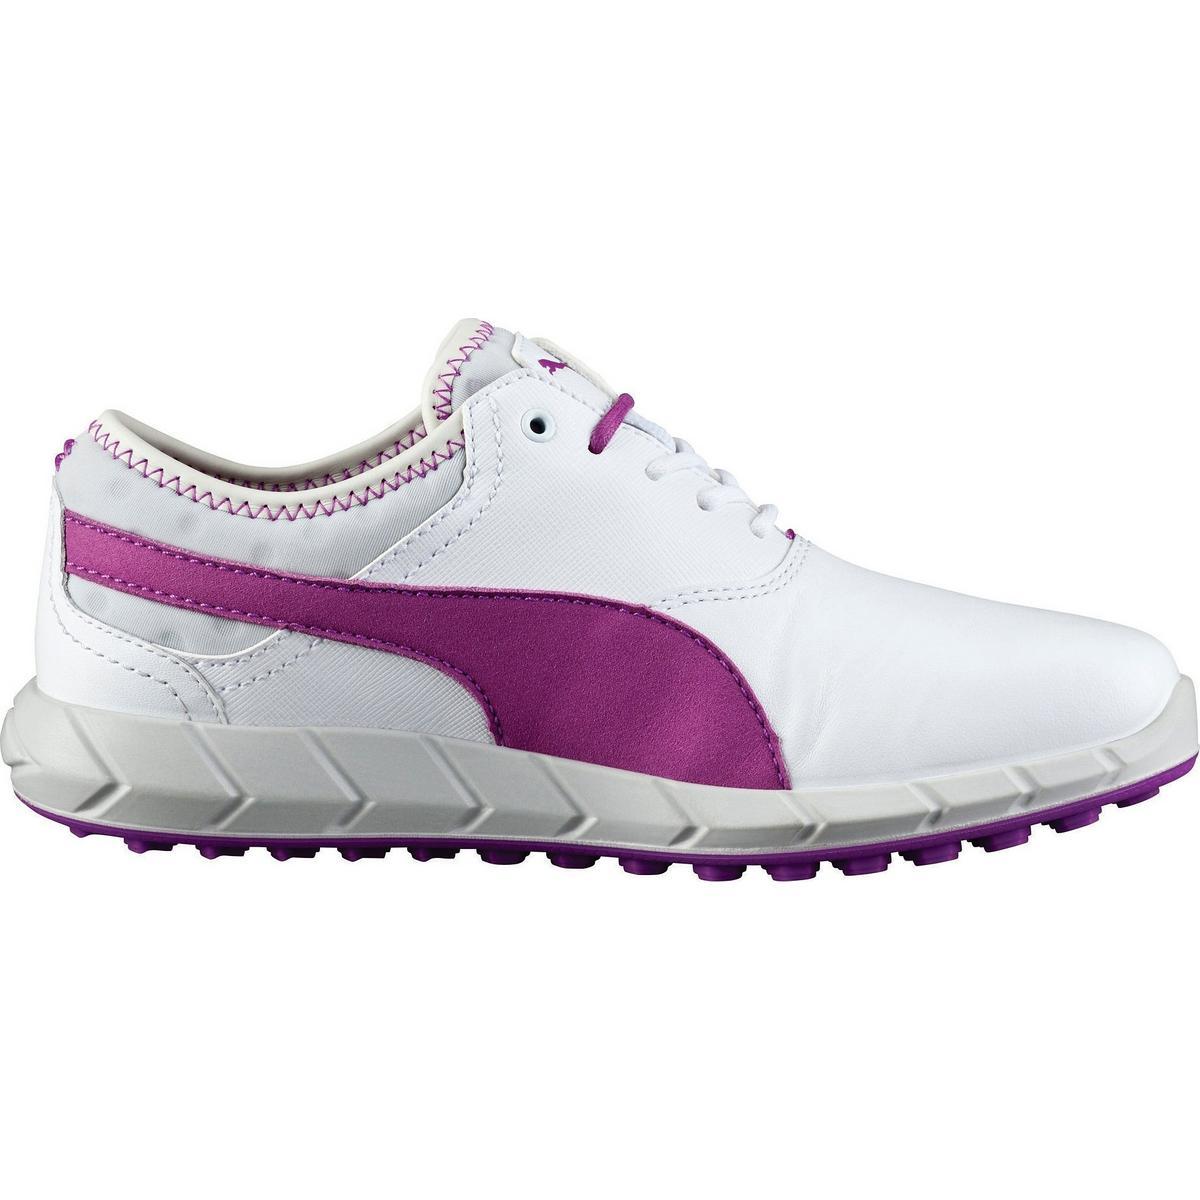 wholesale dealer deac3 45ad8 ... Puma 312bfea Golf Womens Puma Ignite Spiked Golf Shoes - WhitePurple  Cactus 9ab7a910 ...